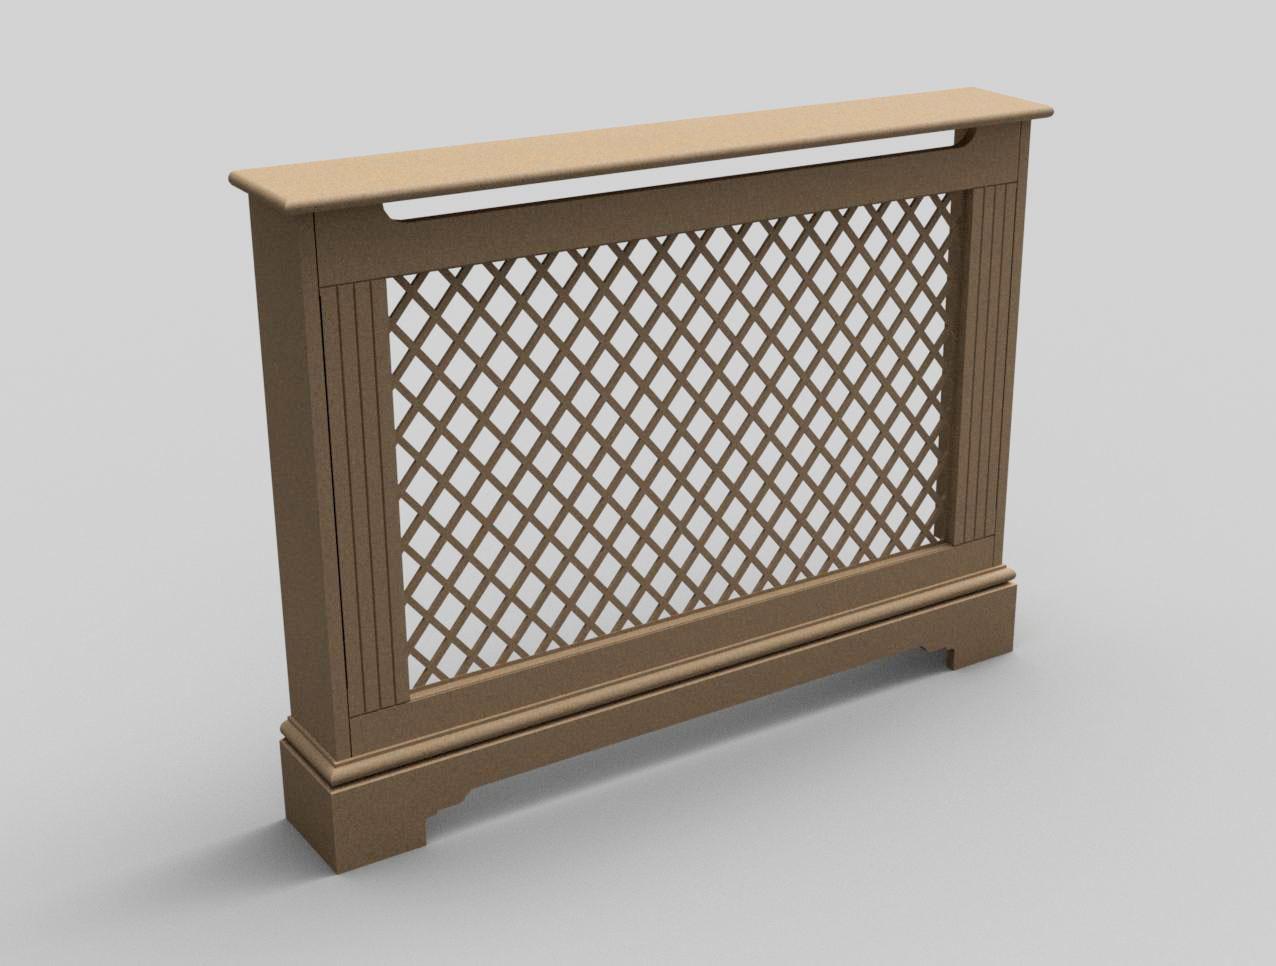 radiator cover 13